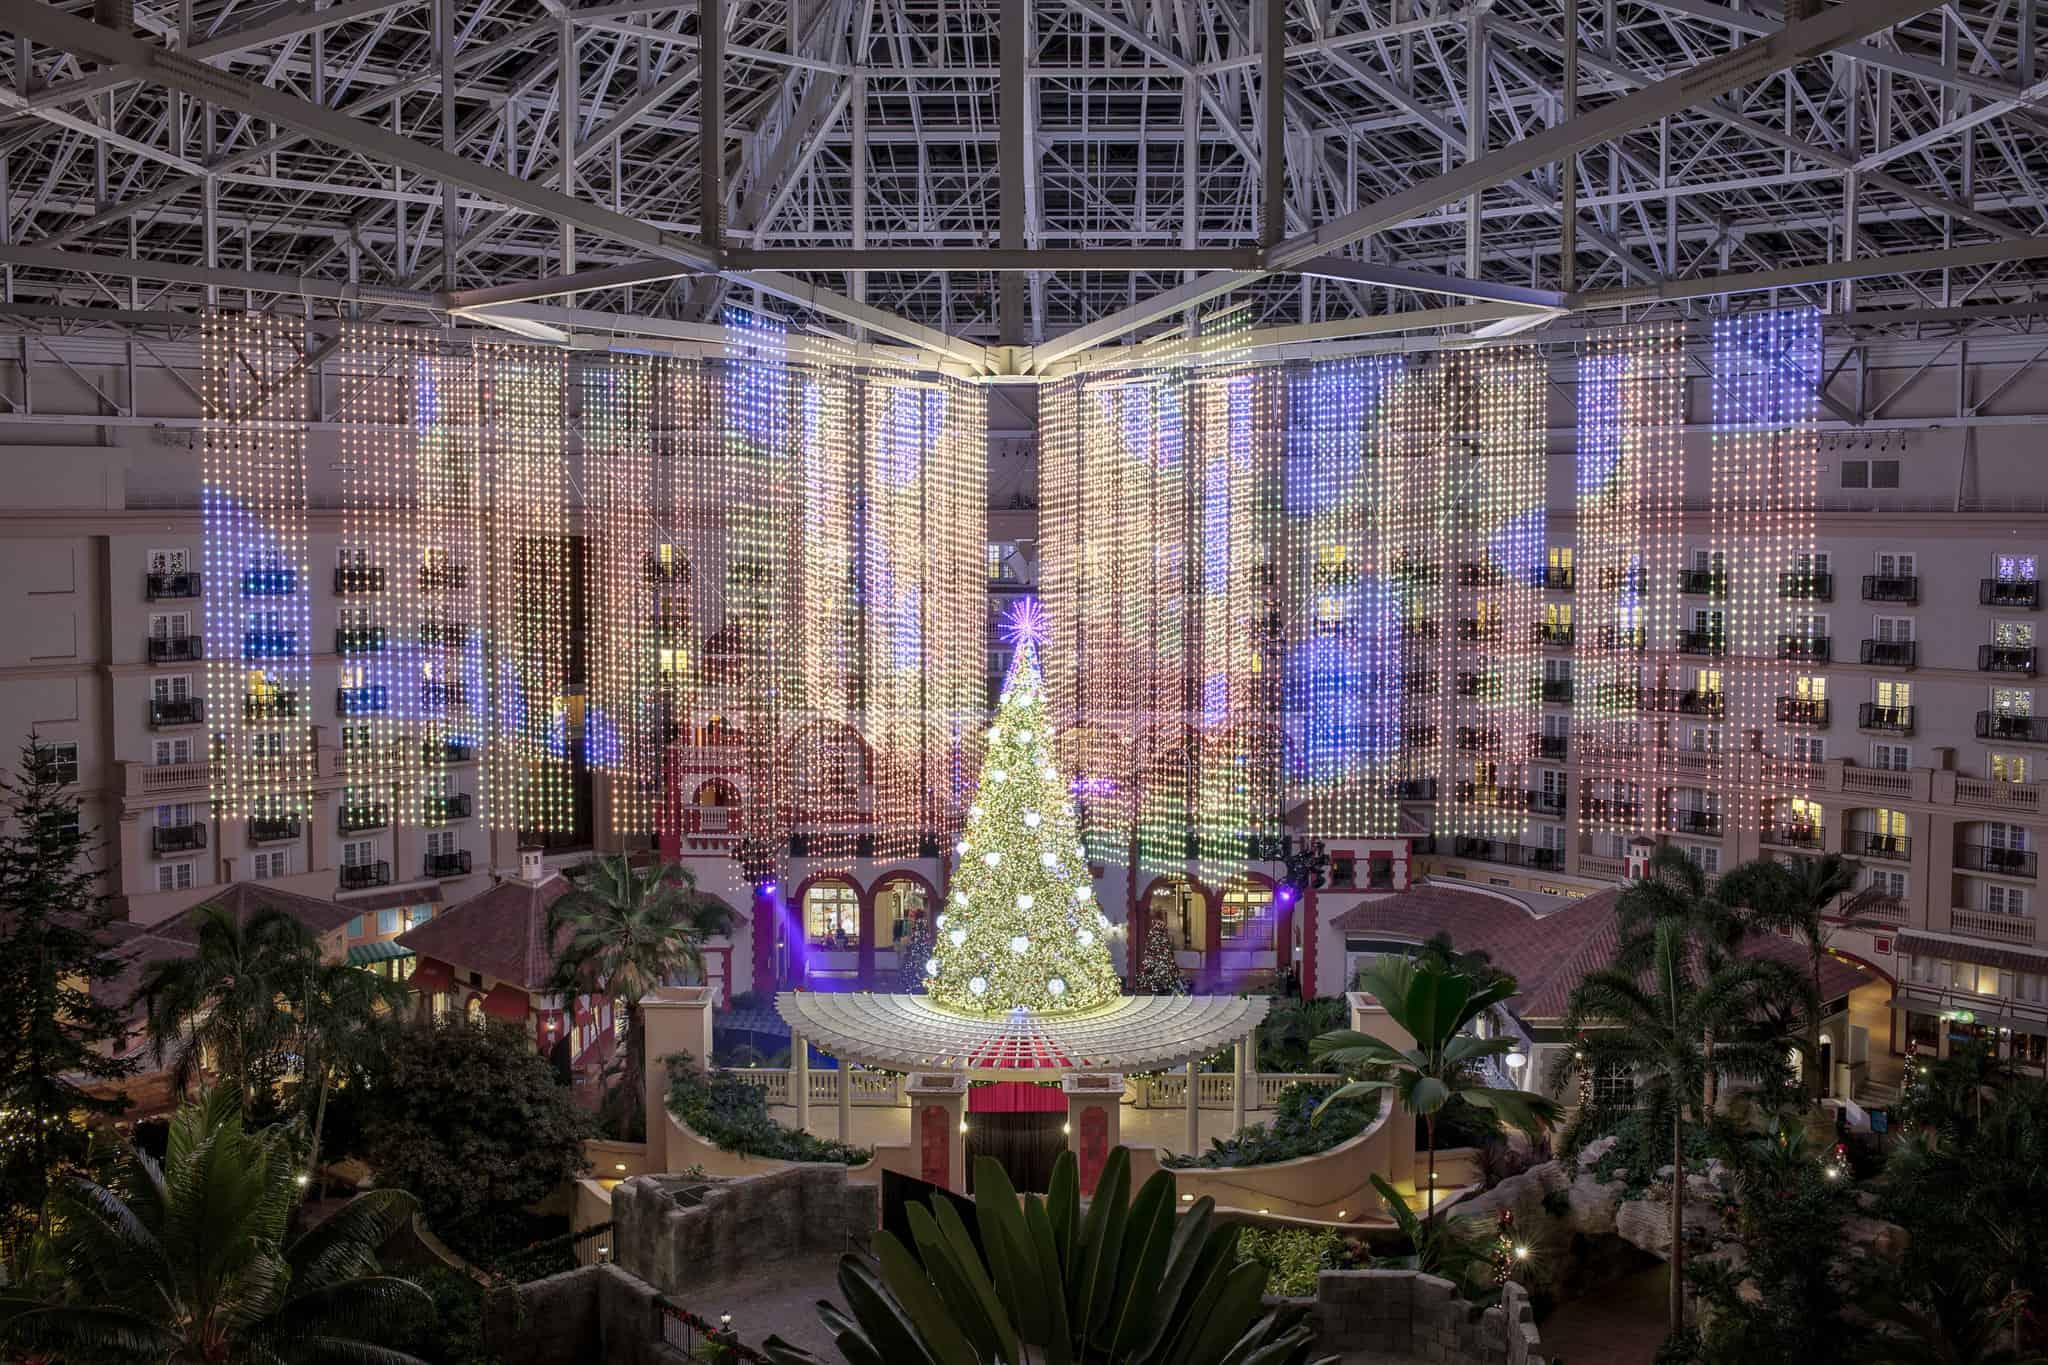 Gaylord Palms Atrium Christmas Lights